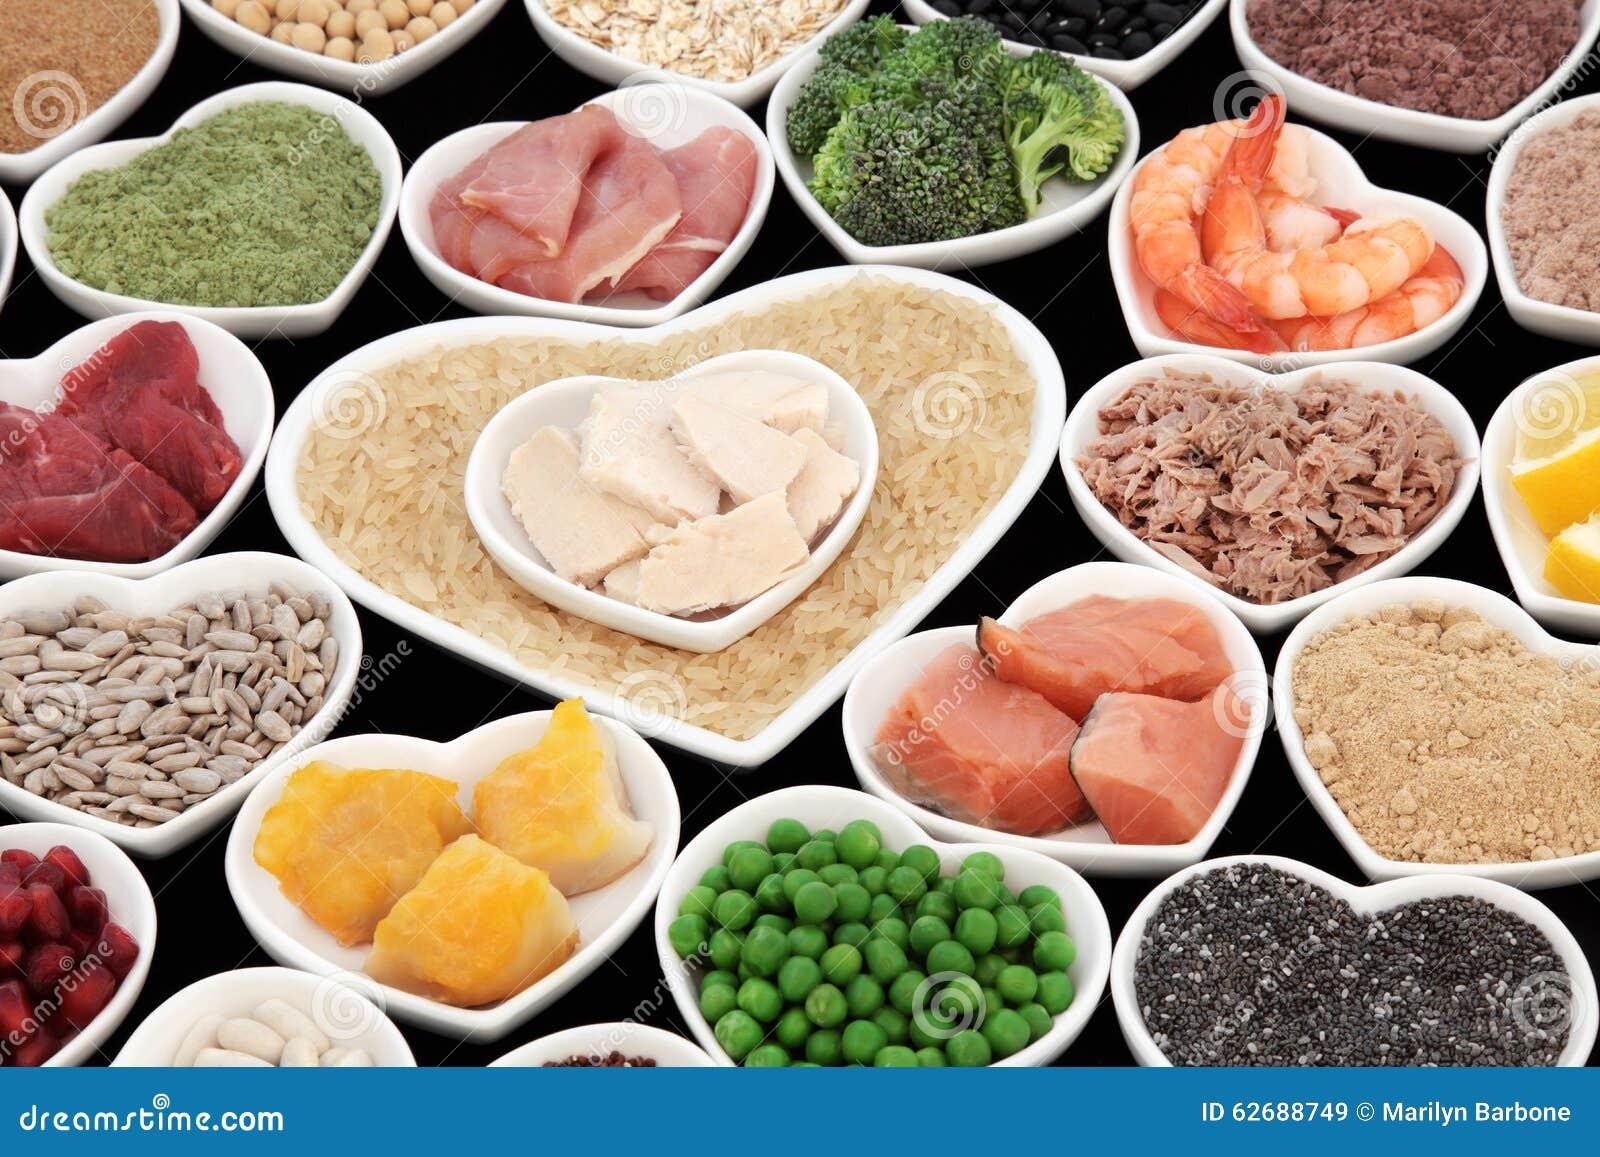 Healthy diet food stock image image of hemp maca fresh for Fish and veggie diet